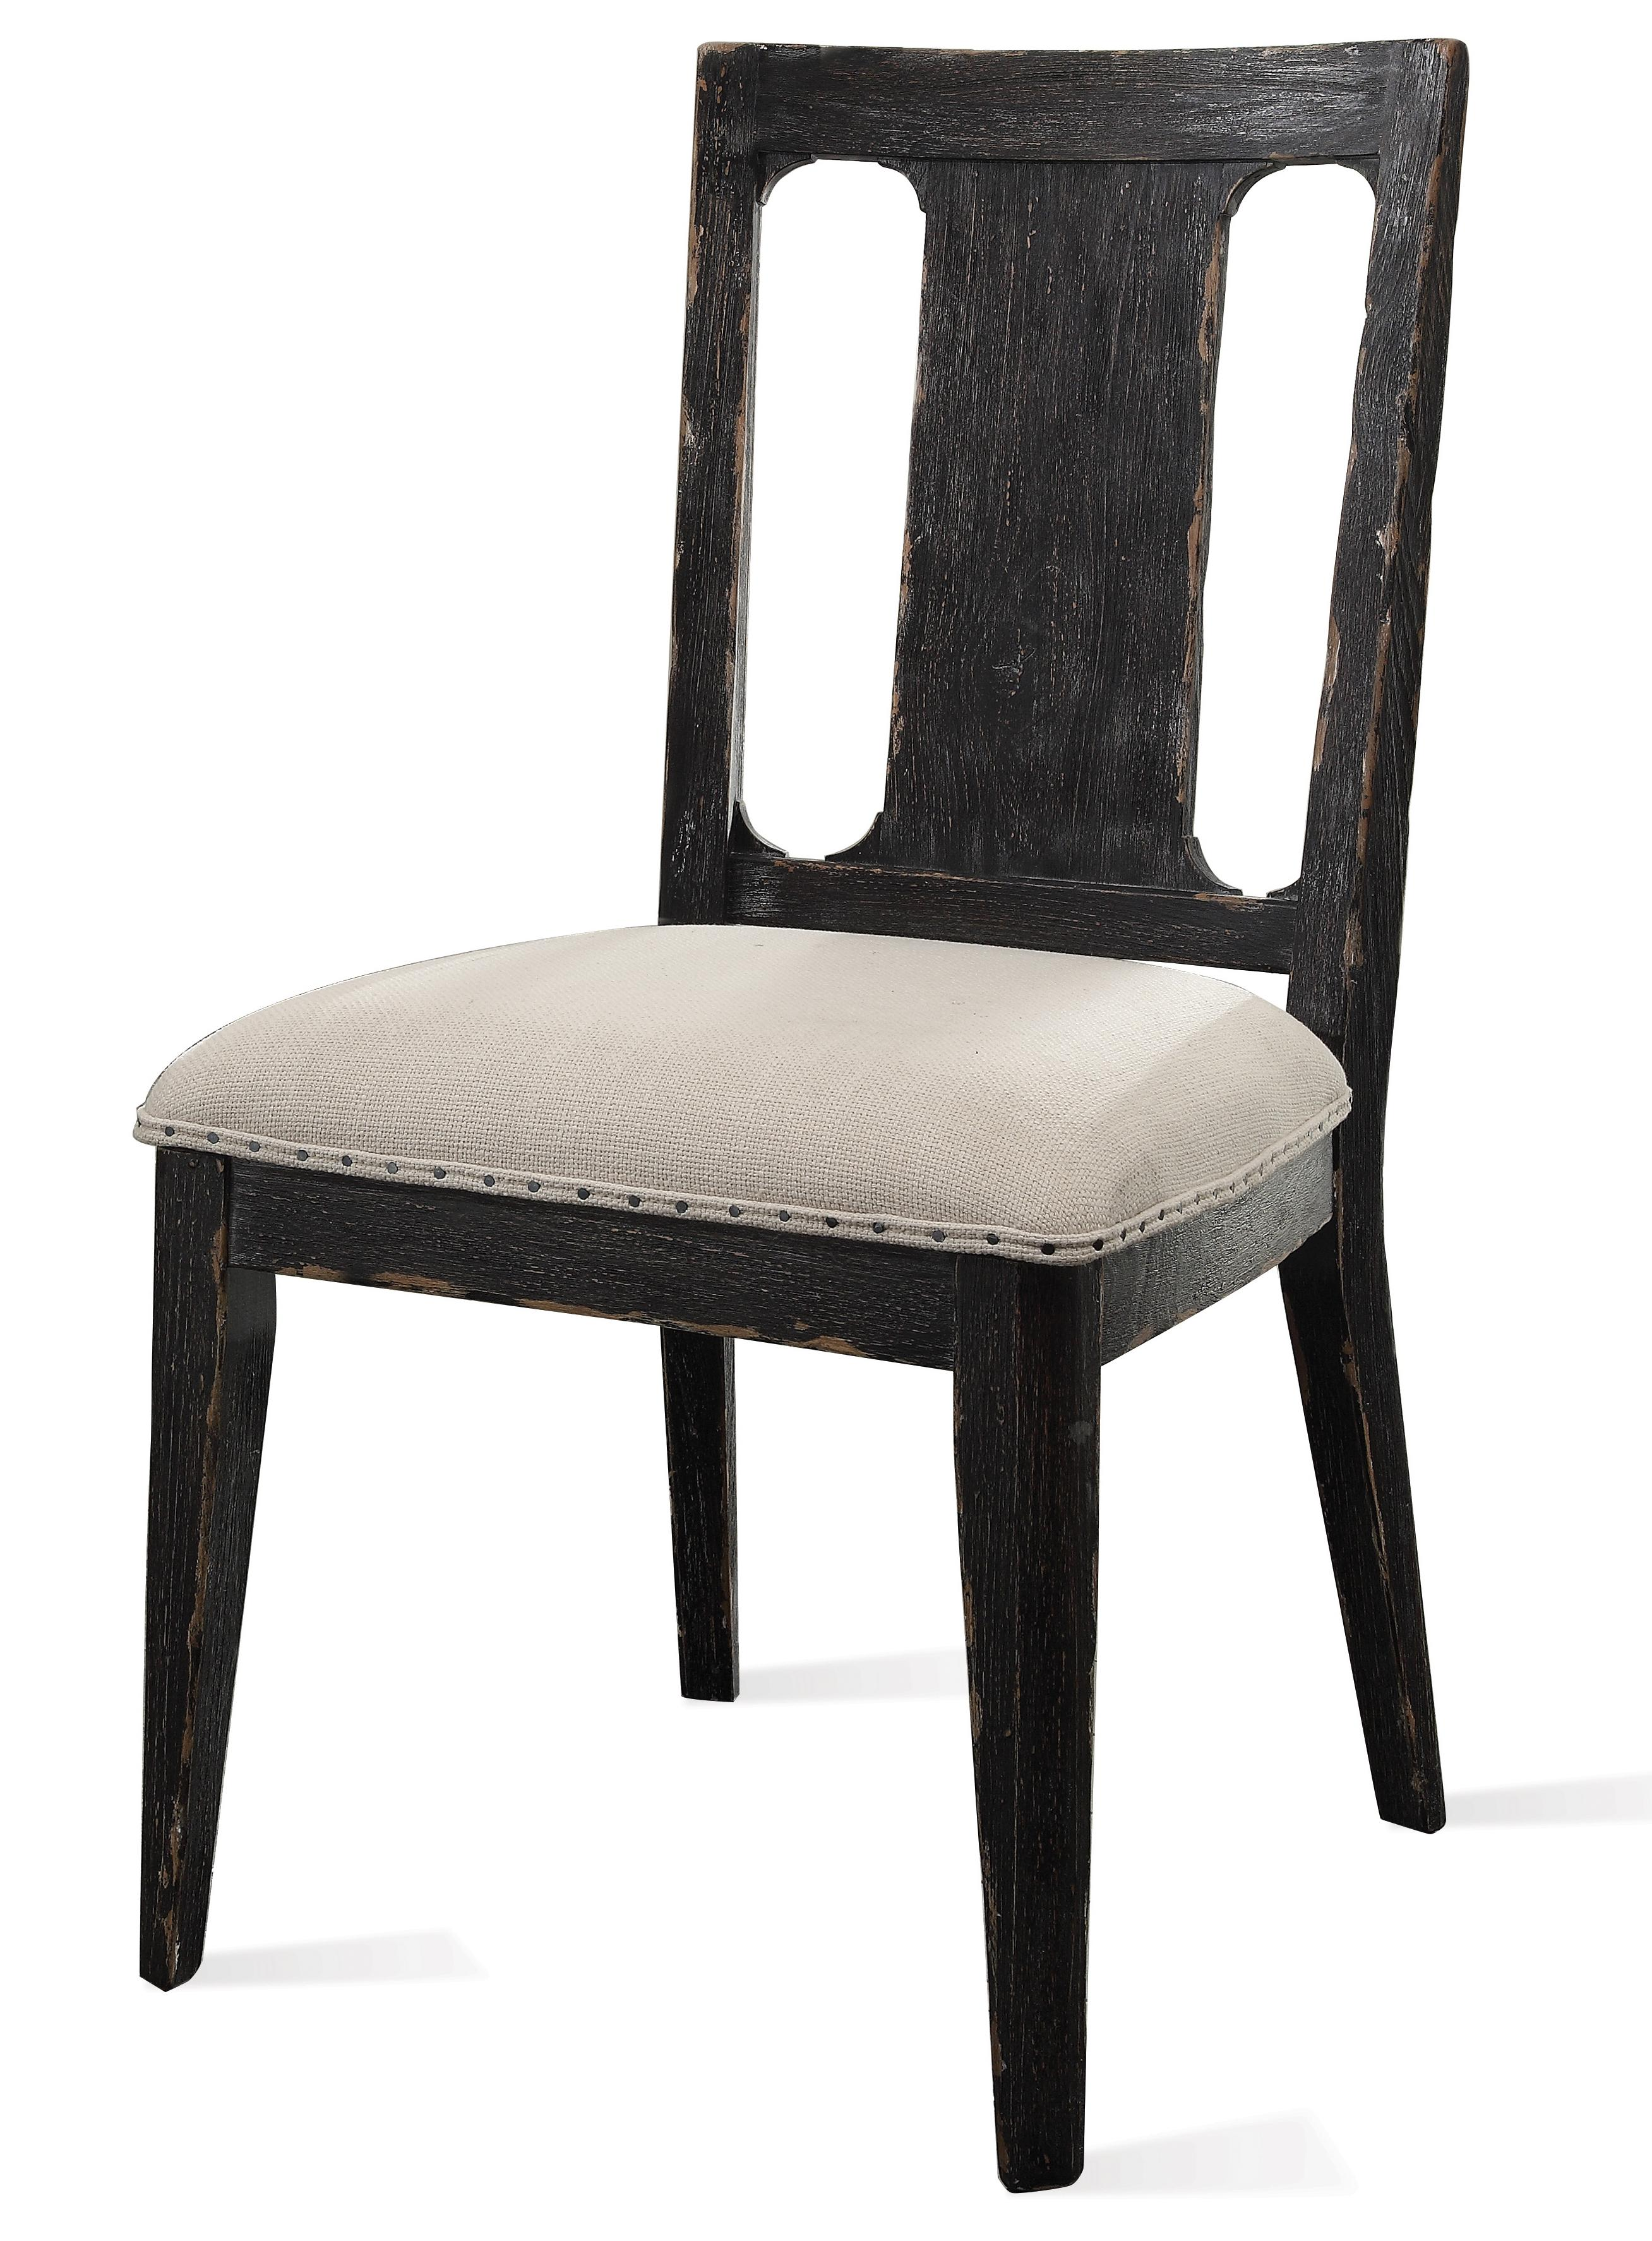 Riverside Furniture Bellagio Side Chair - Item Number: 11857